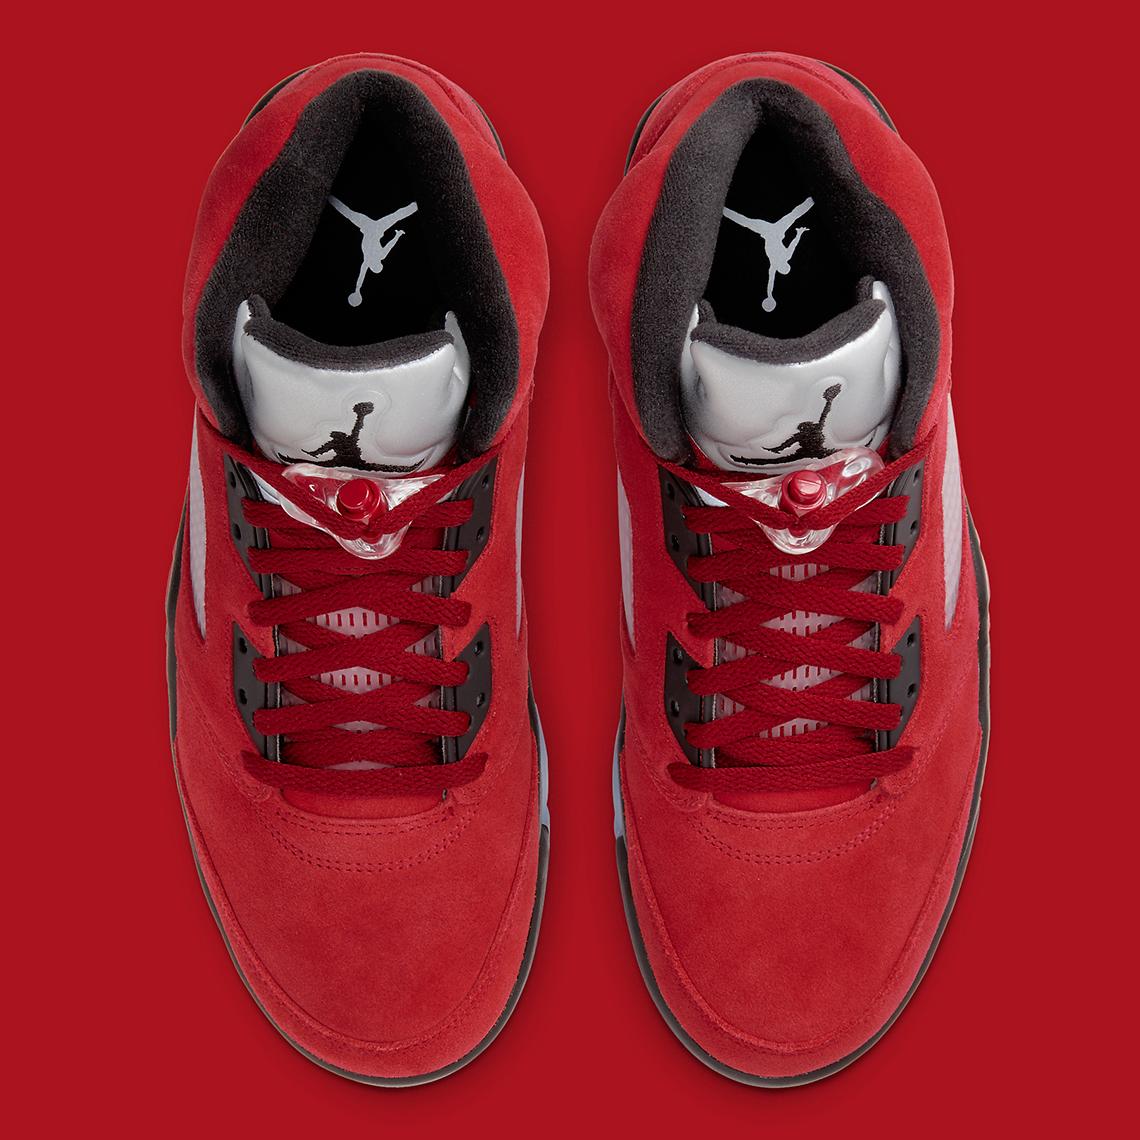 Air Jordan 5 Retro PS 'Raging Bull' 2021